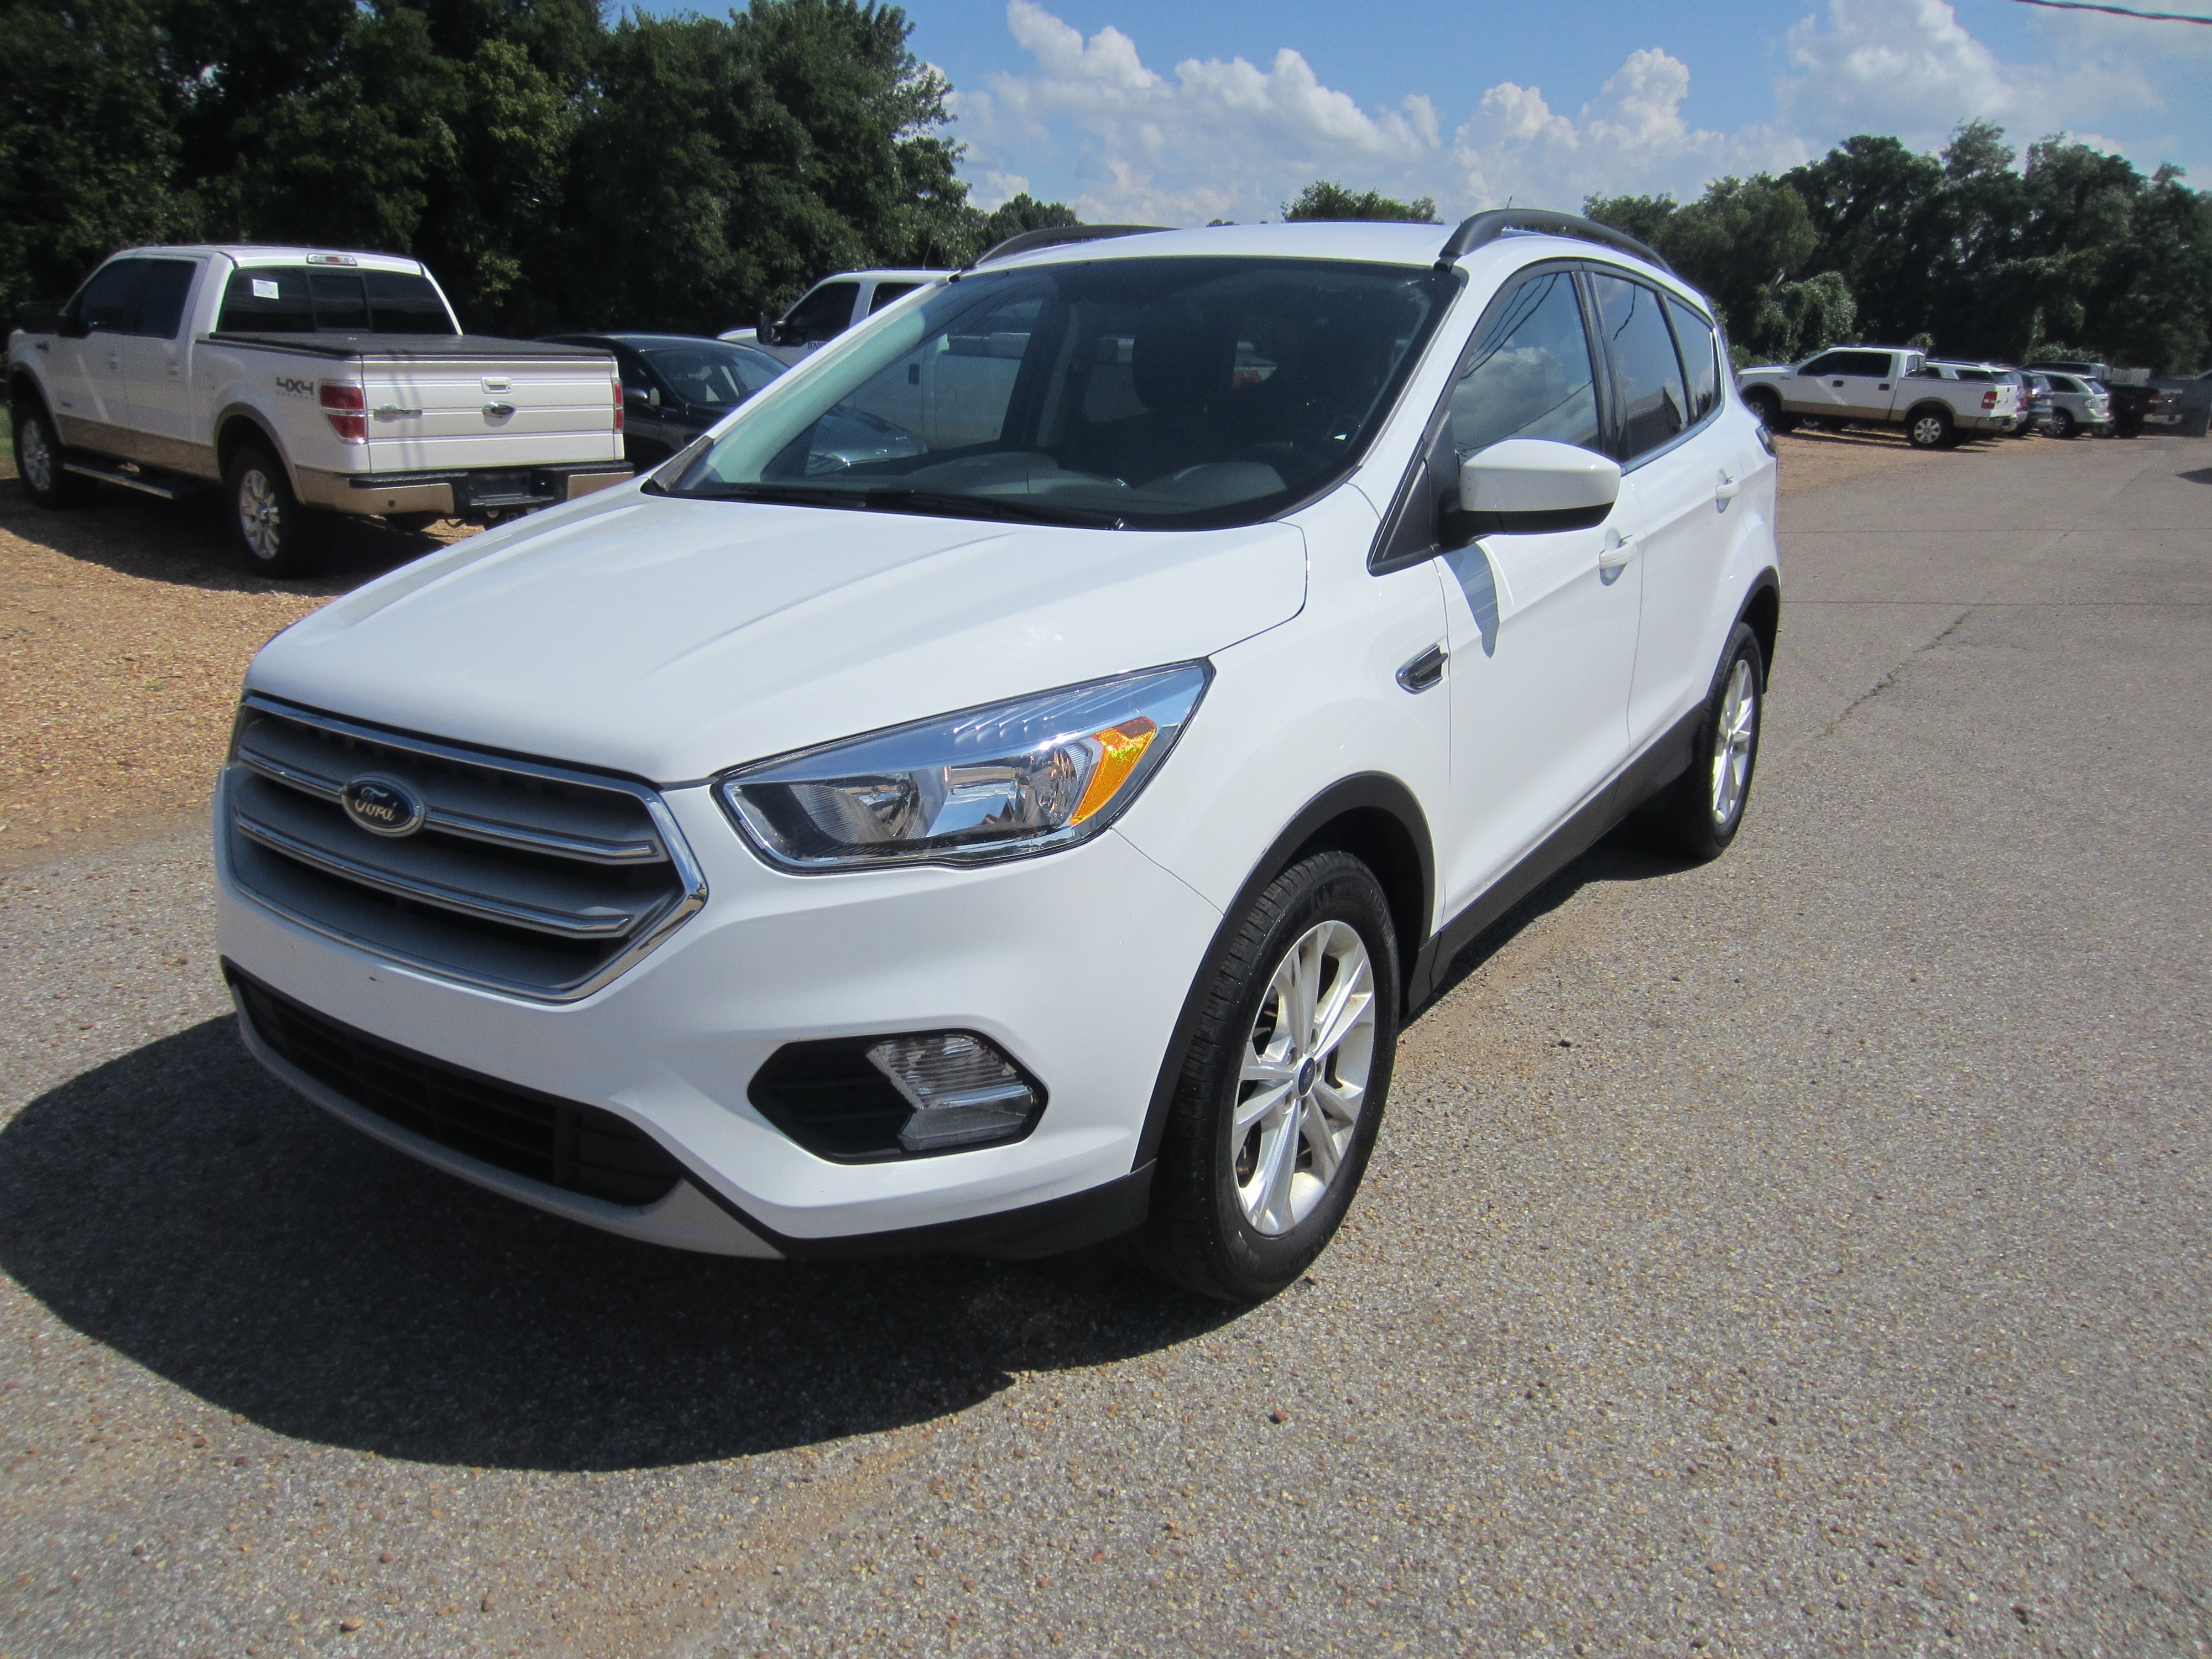 2018 Ford Escape SE Utility Vehicle